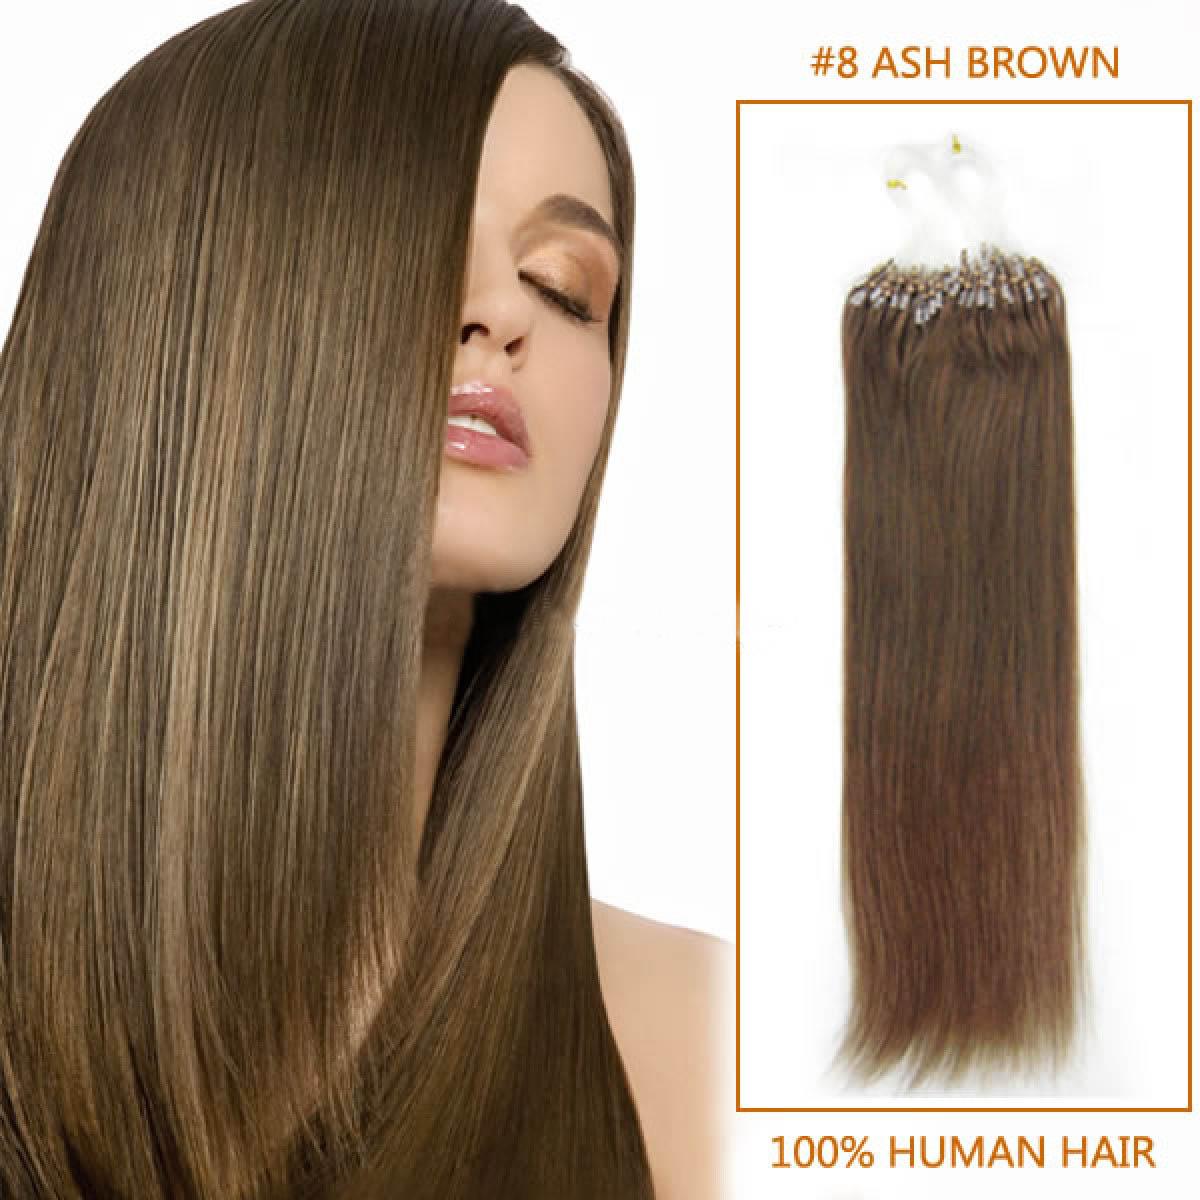 Inch 8 ash brown micro loop human hair extensions 100s 100g 20 inch 8 ash brown micro loop human hair extensions 100s 100g pmusecretfo Image collections